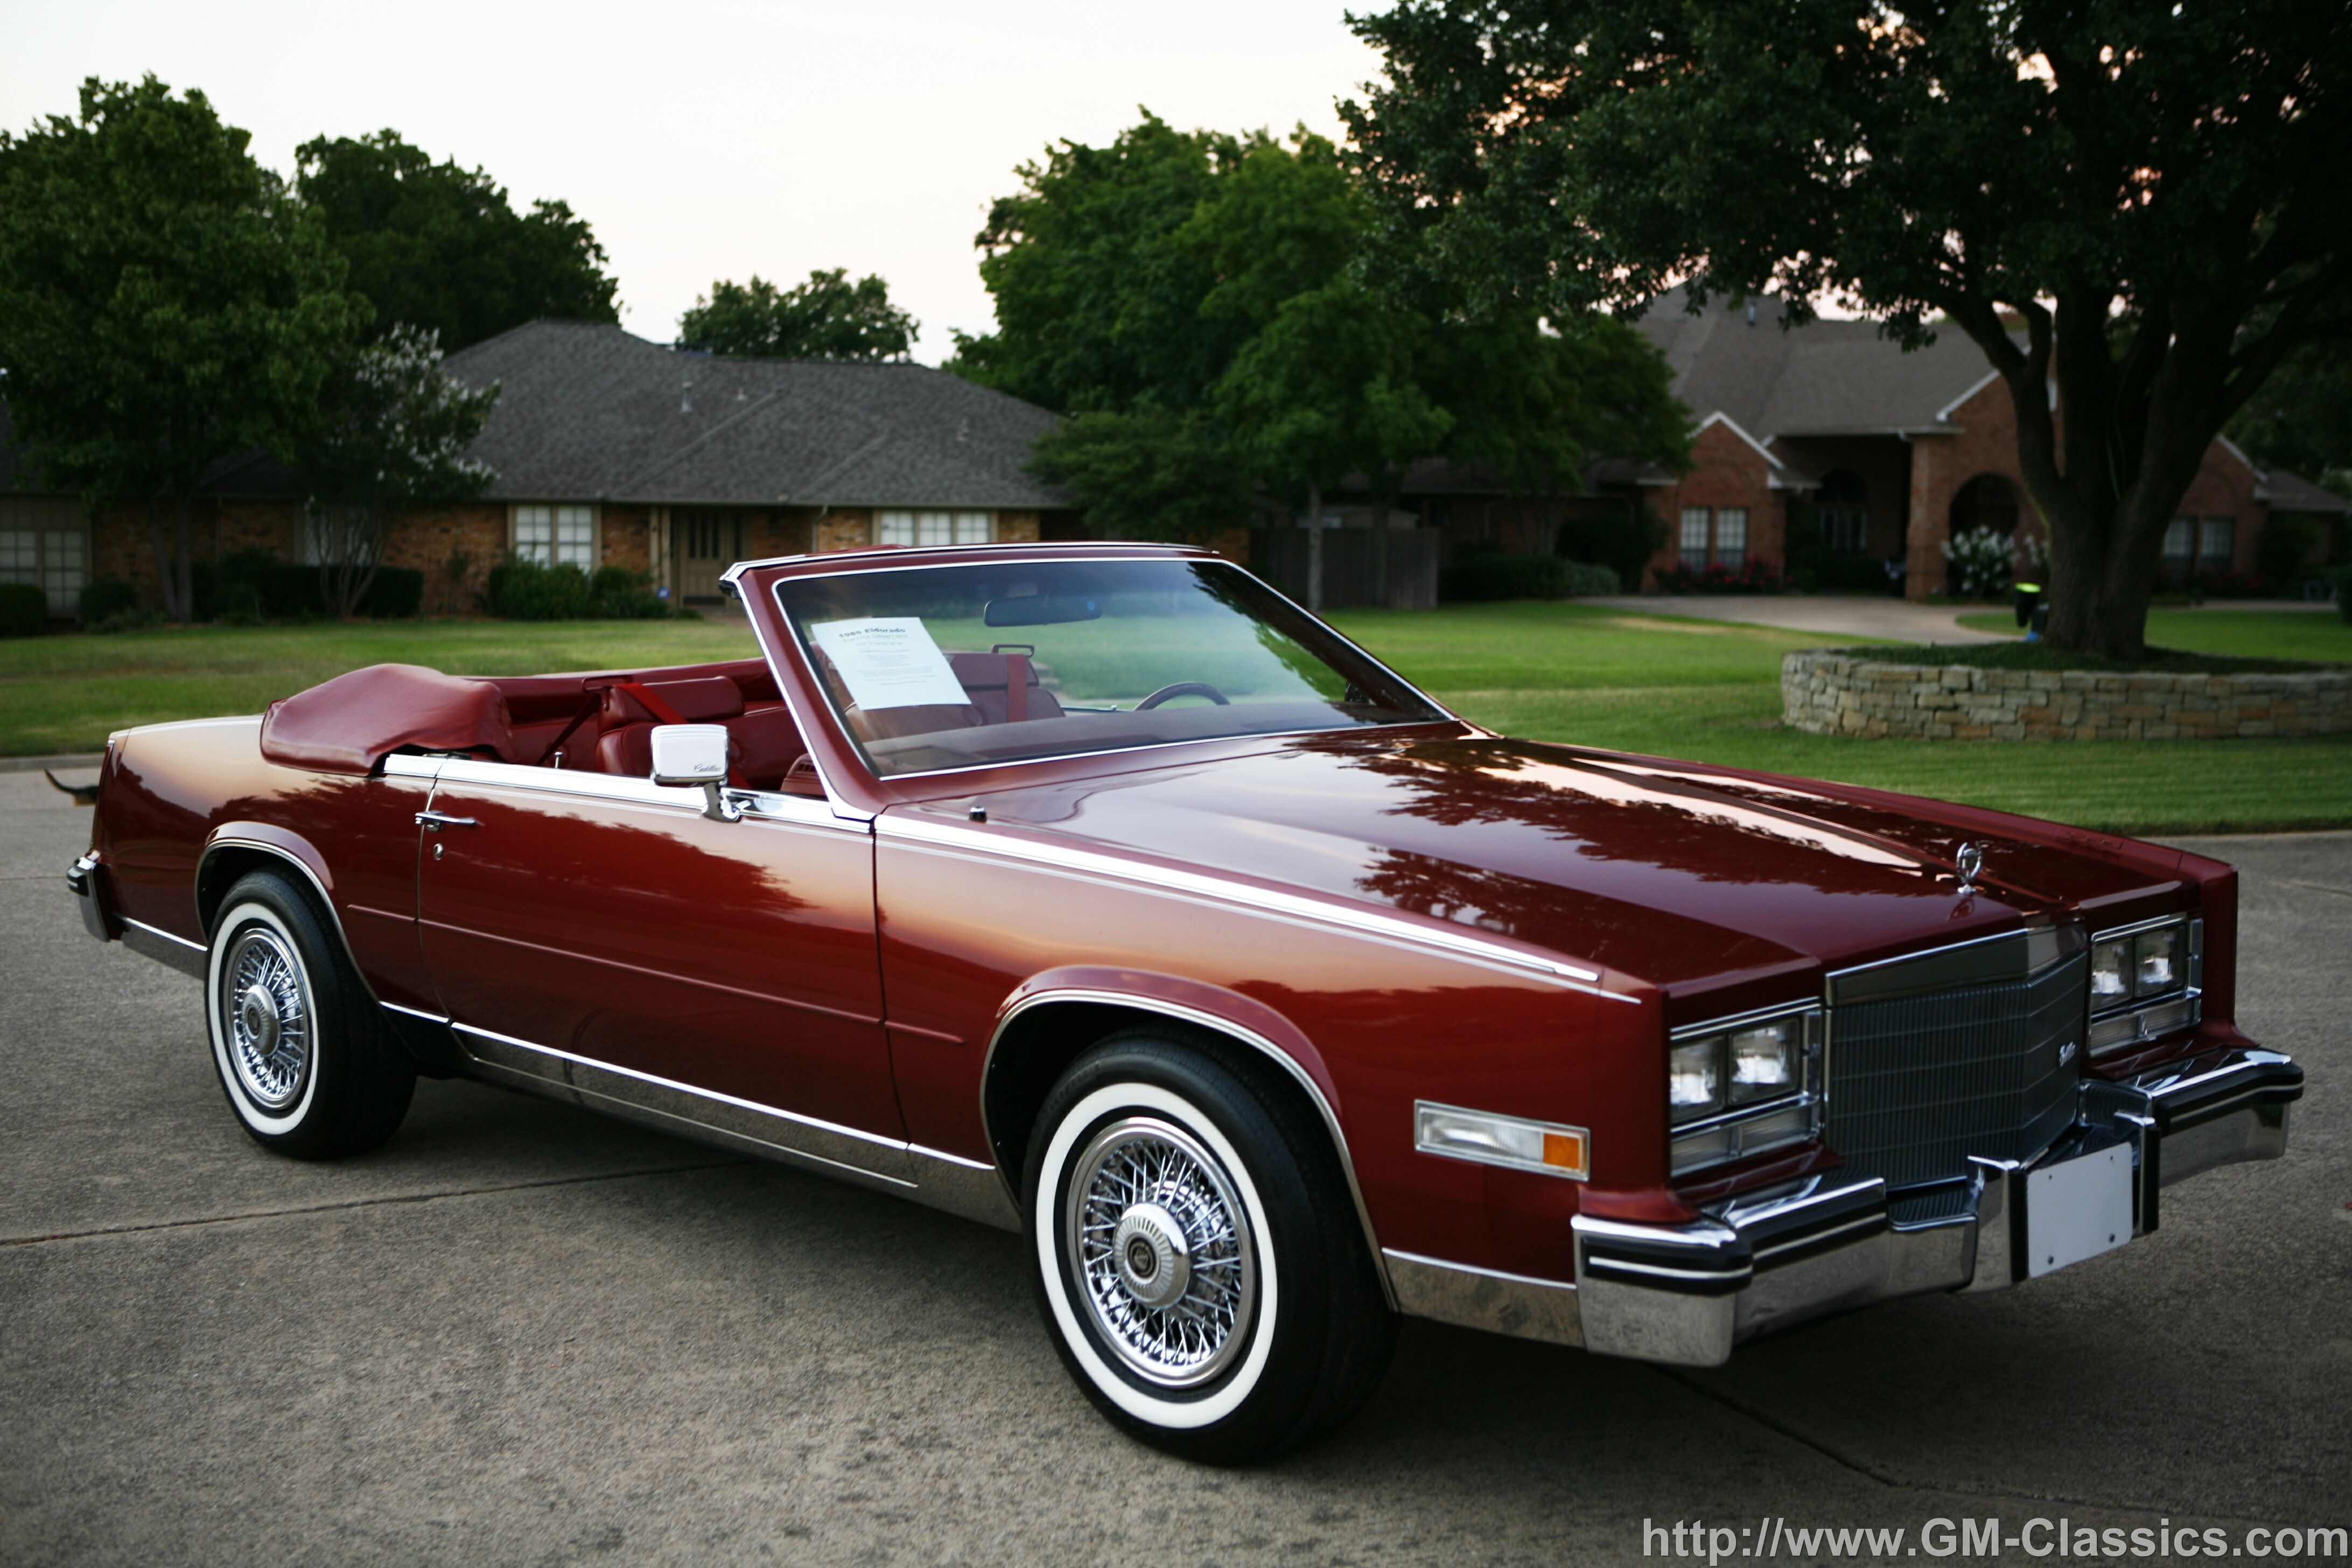 85 eldordo | 1985 Cadillac Eldorado Biarritz Convertible | old skool